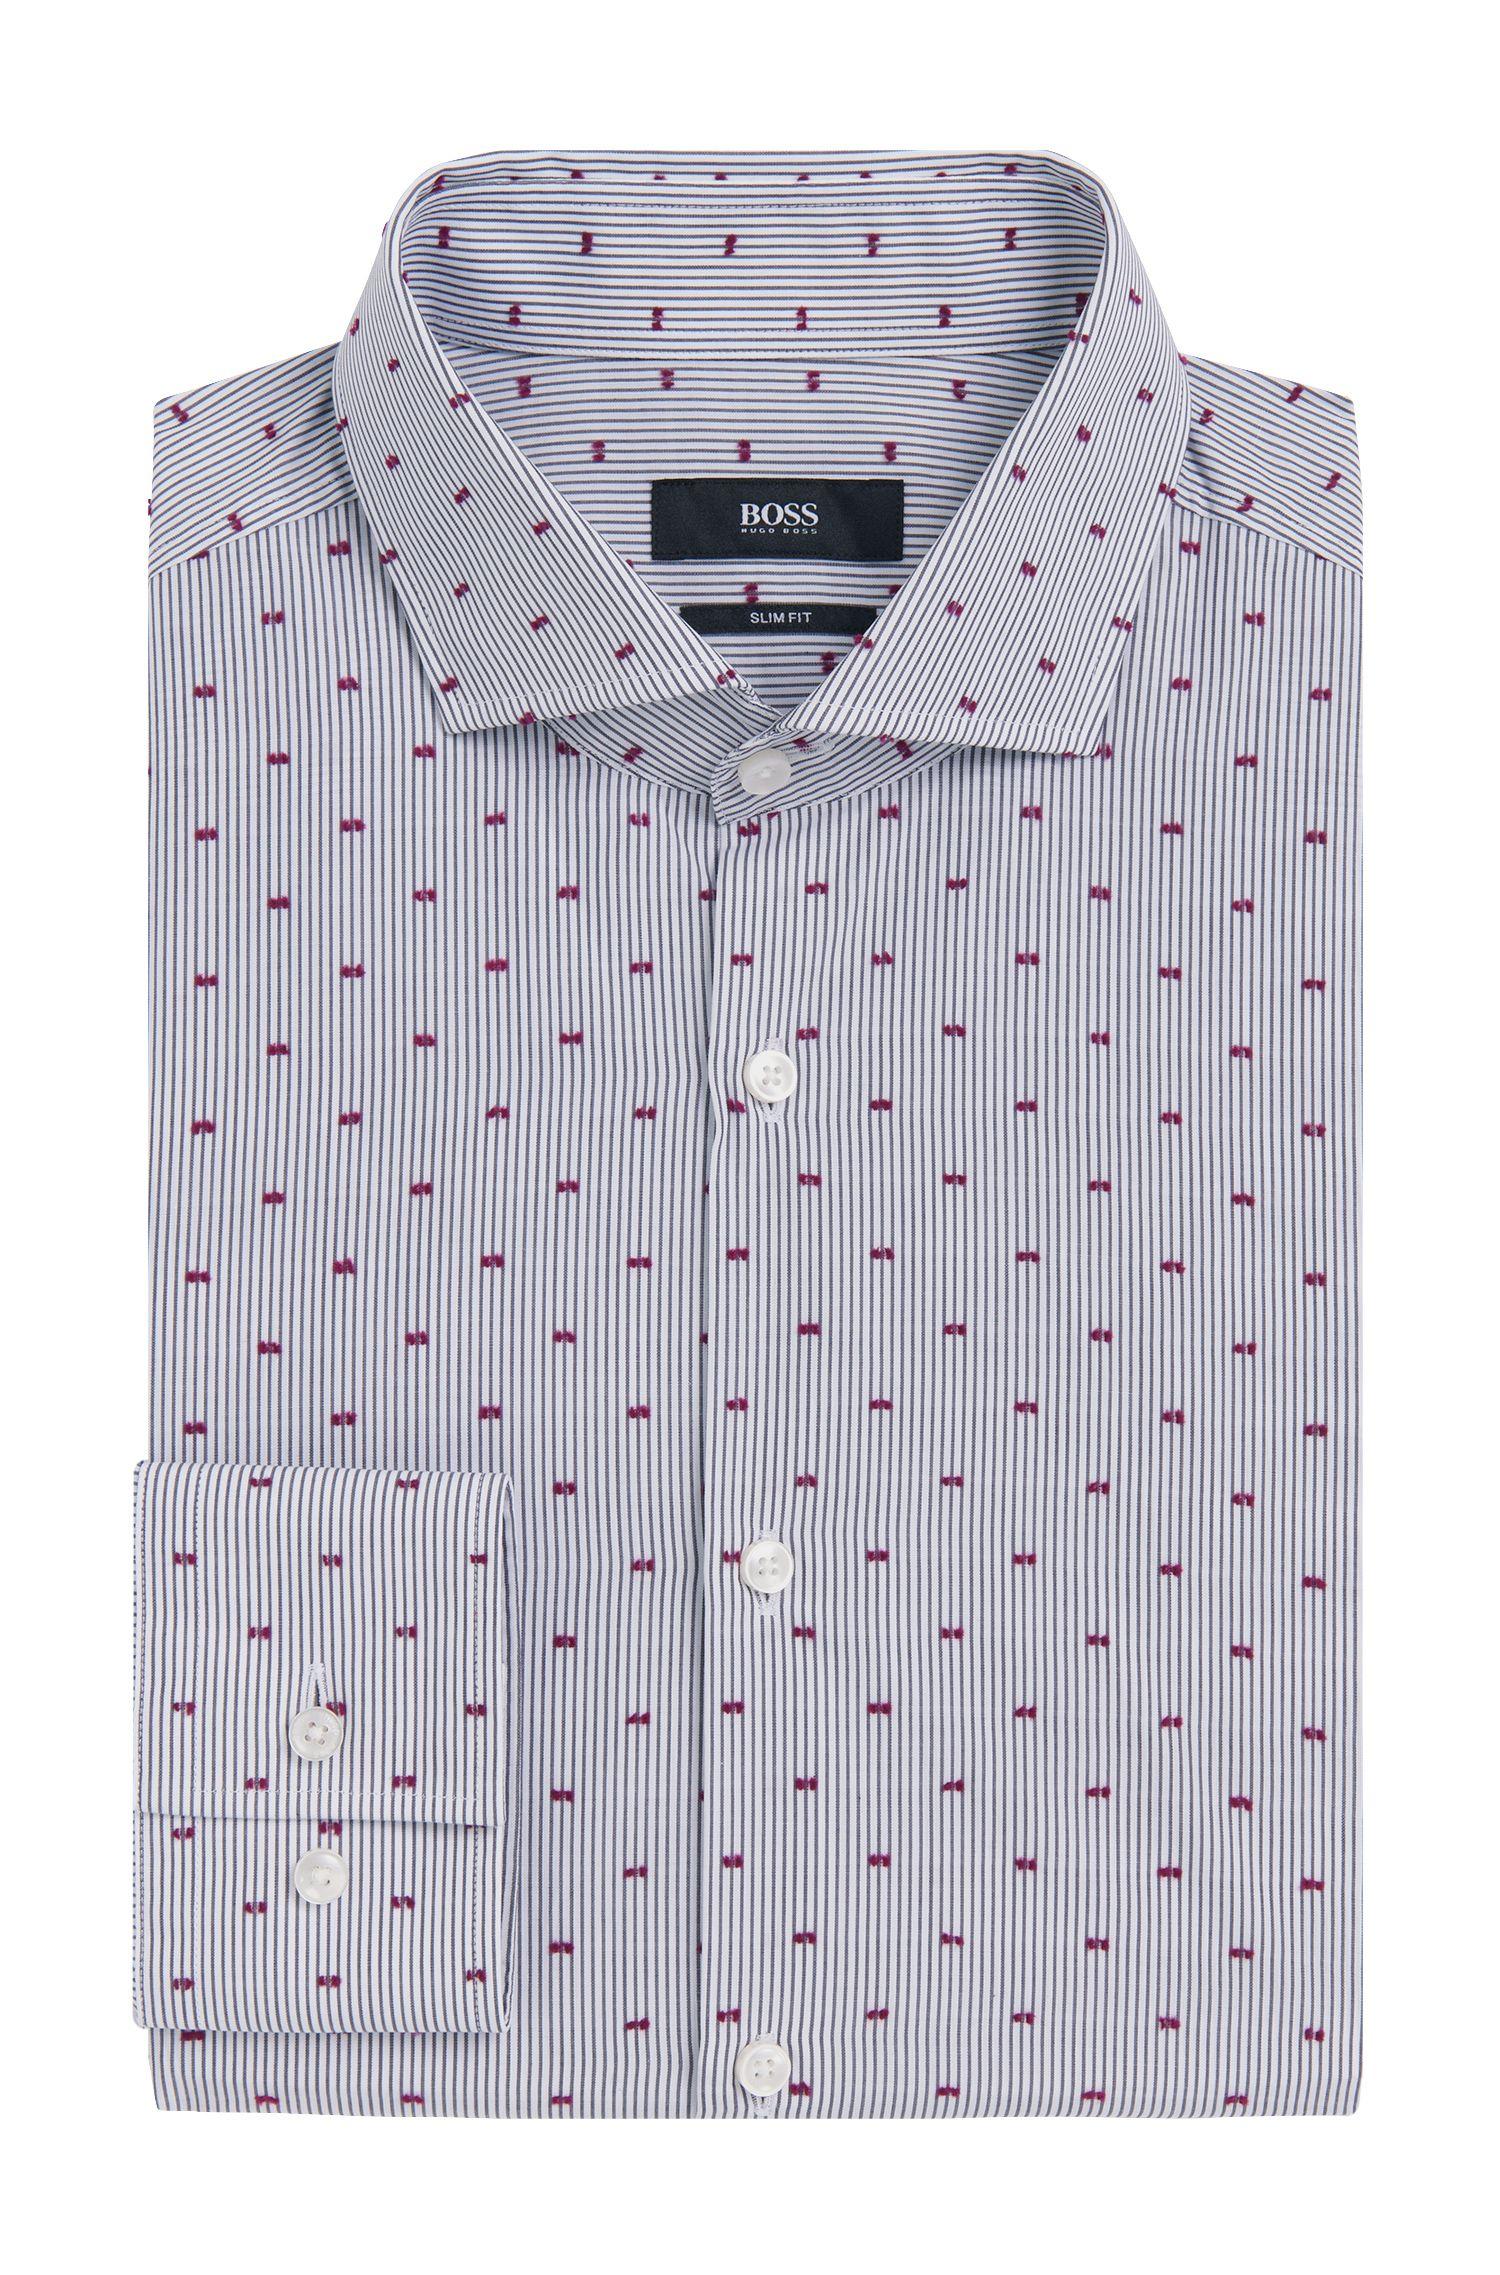 Striped Fil Coupe Cotton Dress Shirt, Slim Fit | Jason